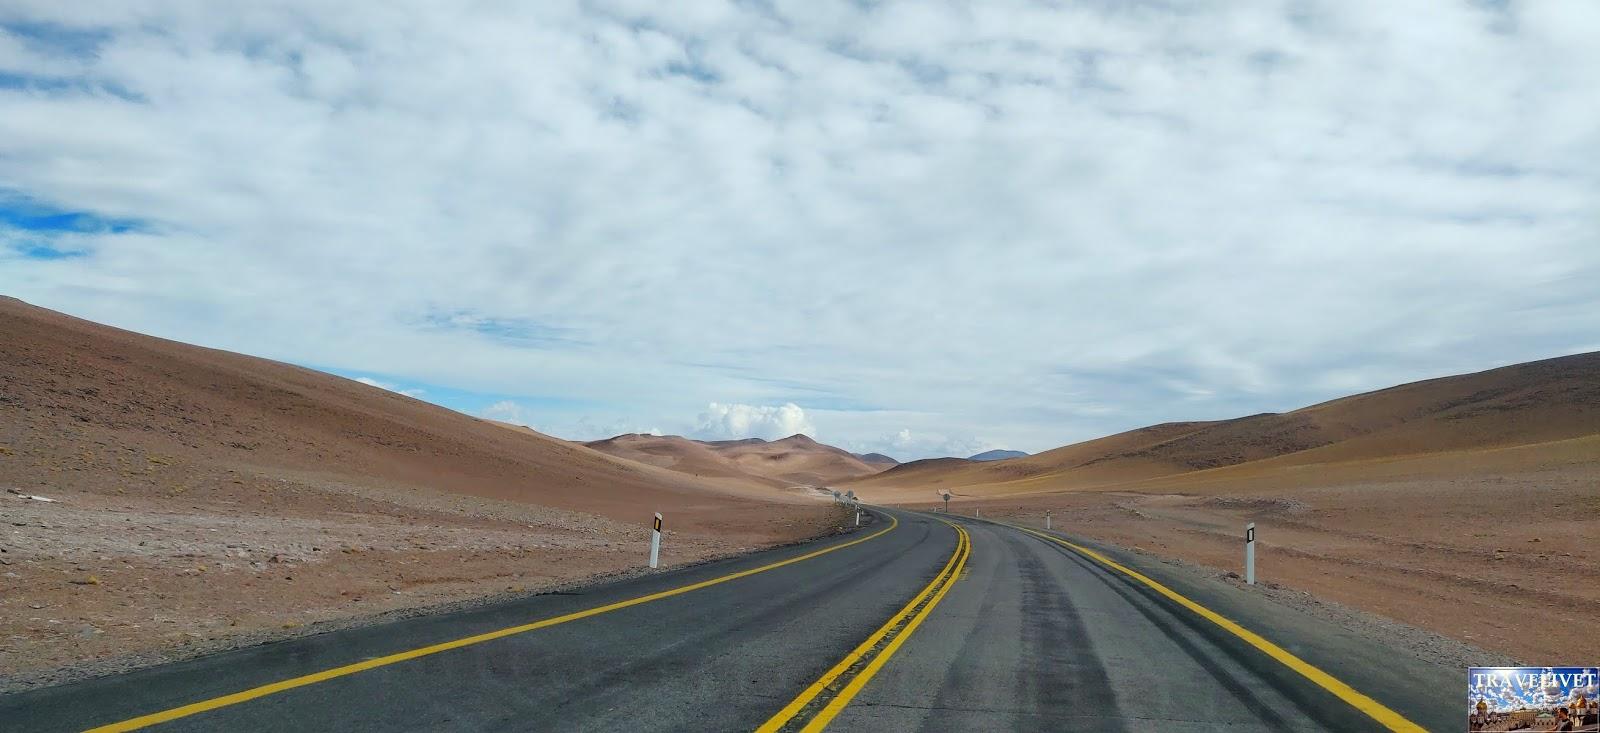 Chili Chile San Pedro de Atacama désert